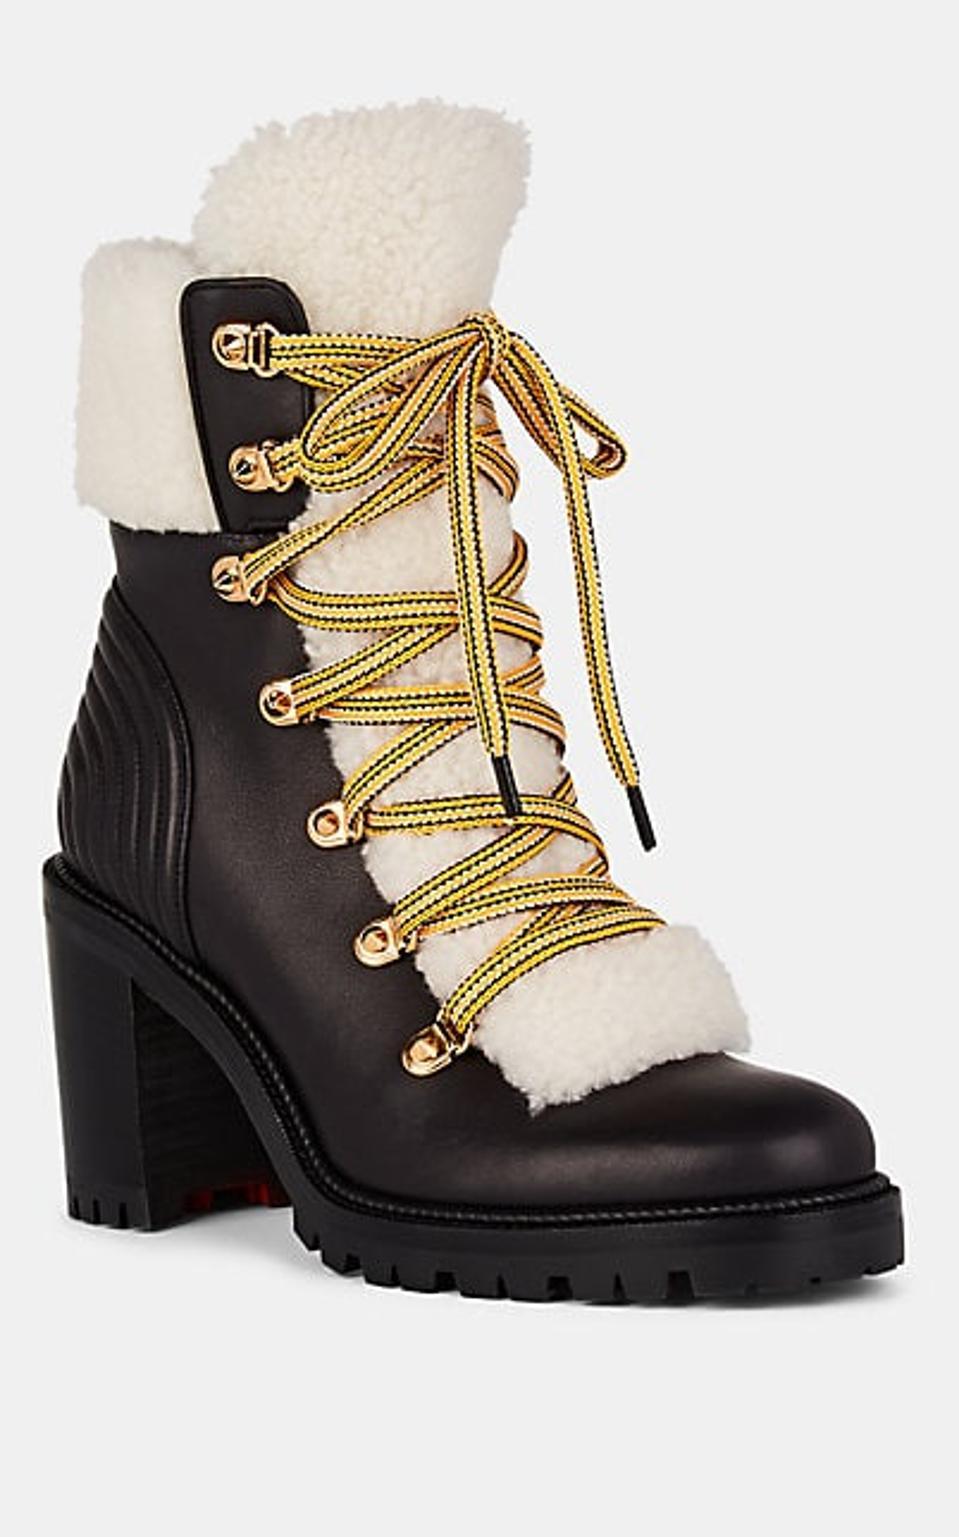 Christian Louboutin_Best Designer Winter Boots